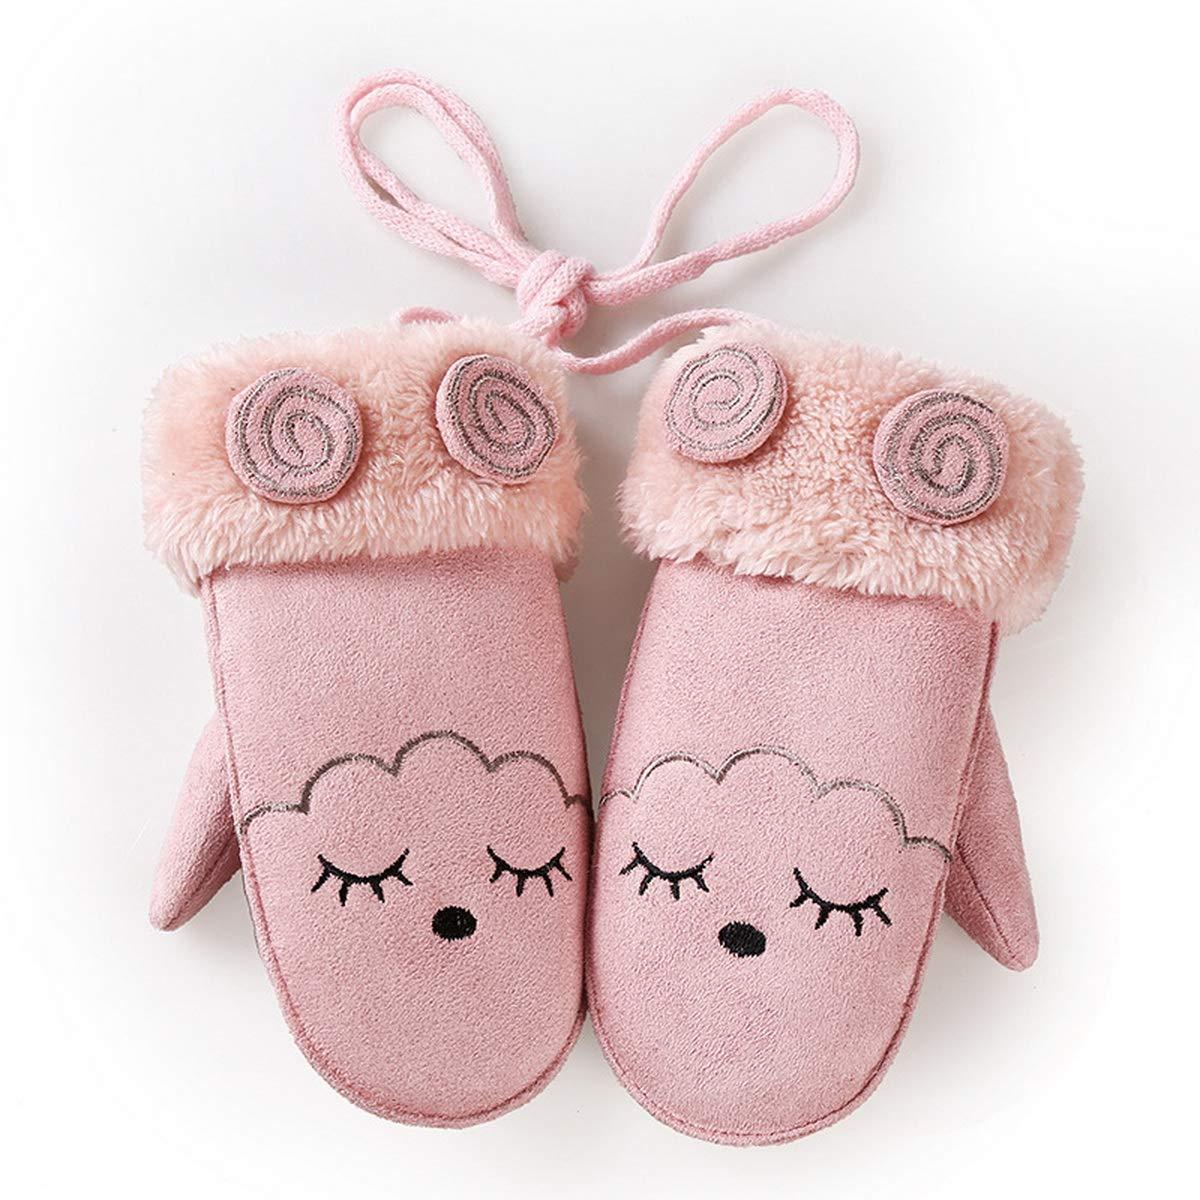 Ukerdo Gloves Children Winter Windproof Cold Weather Ski Gloves for Kids